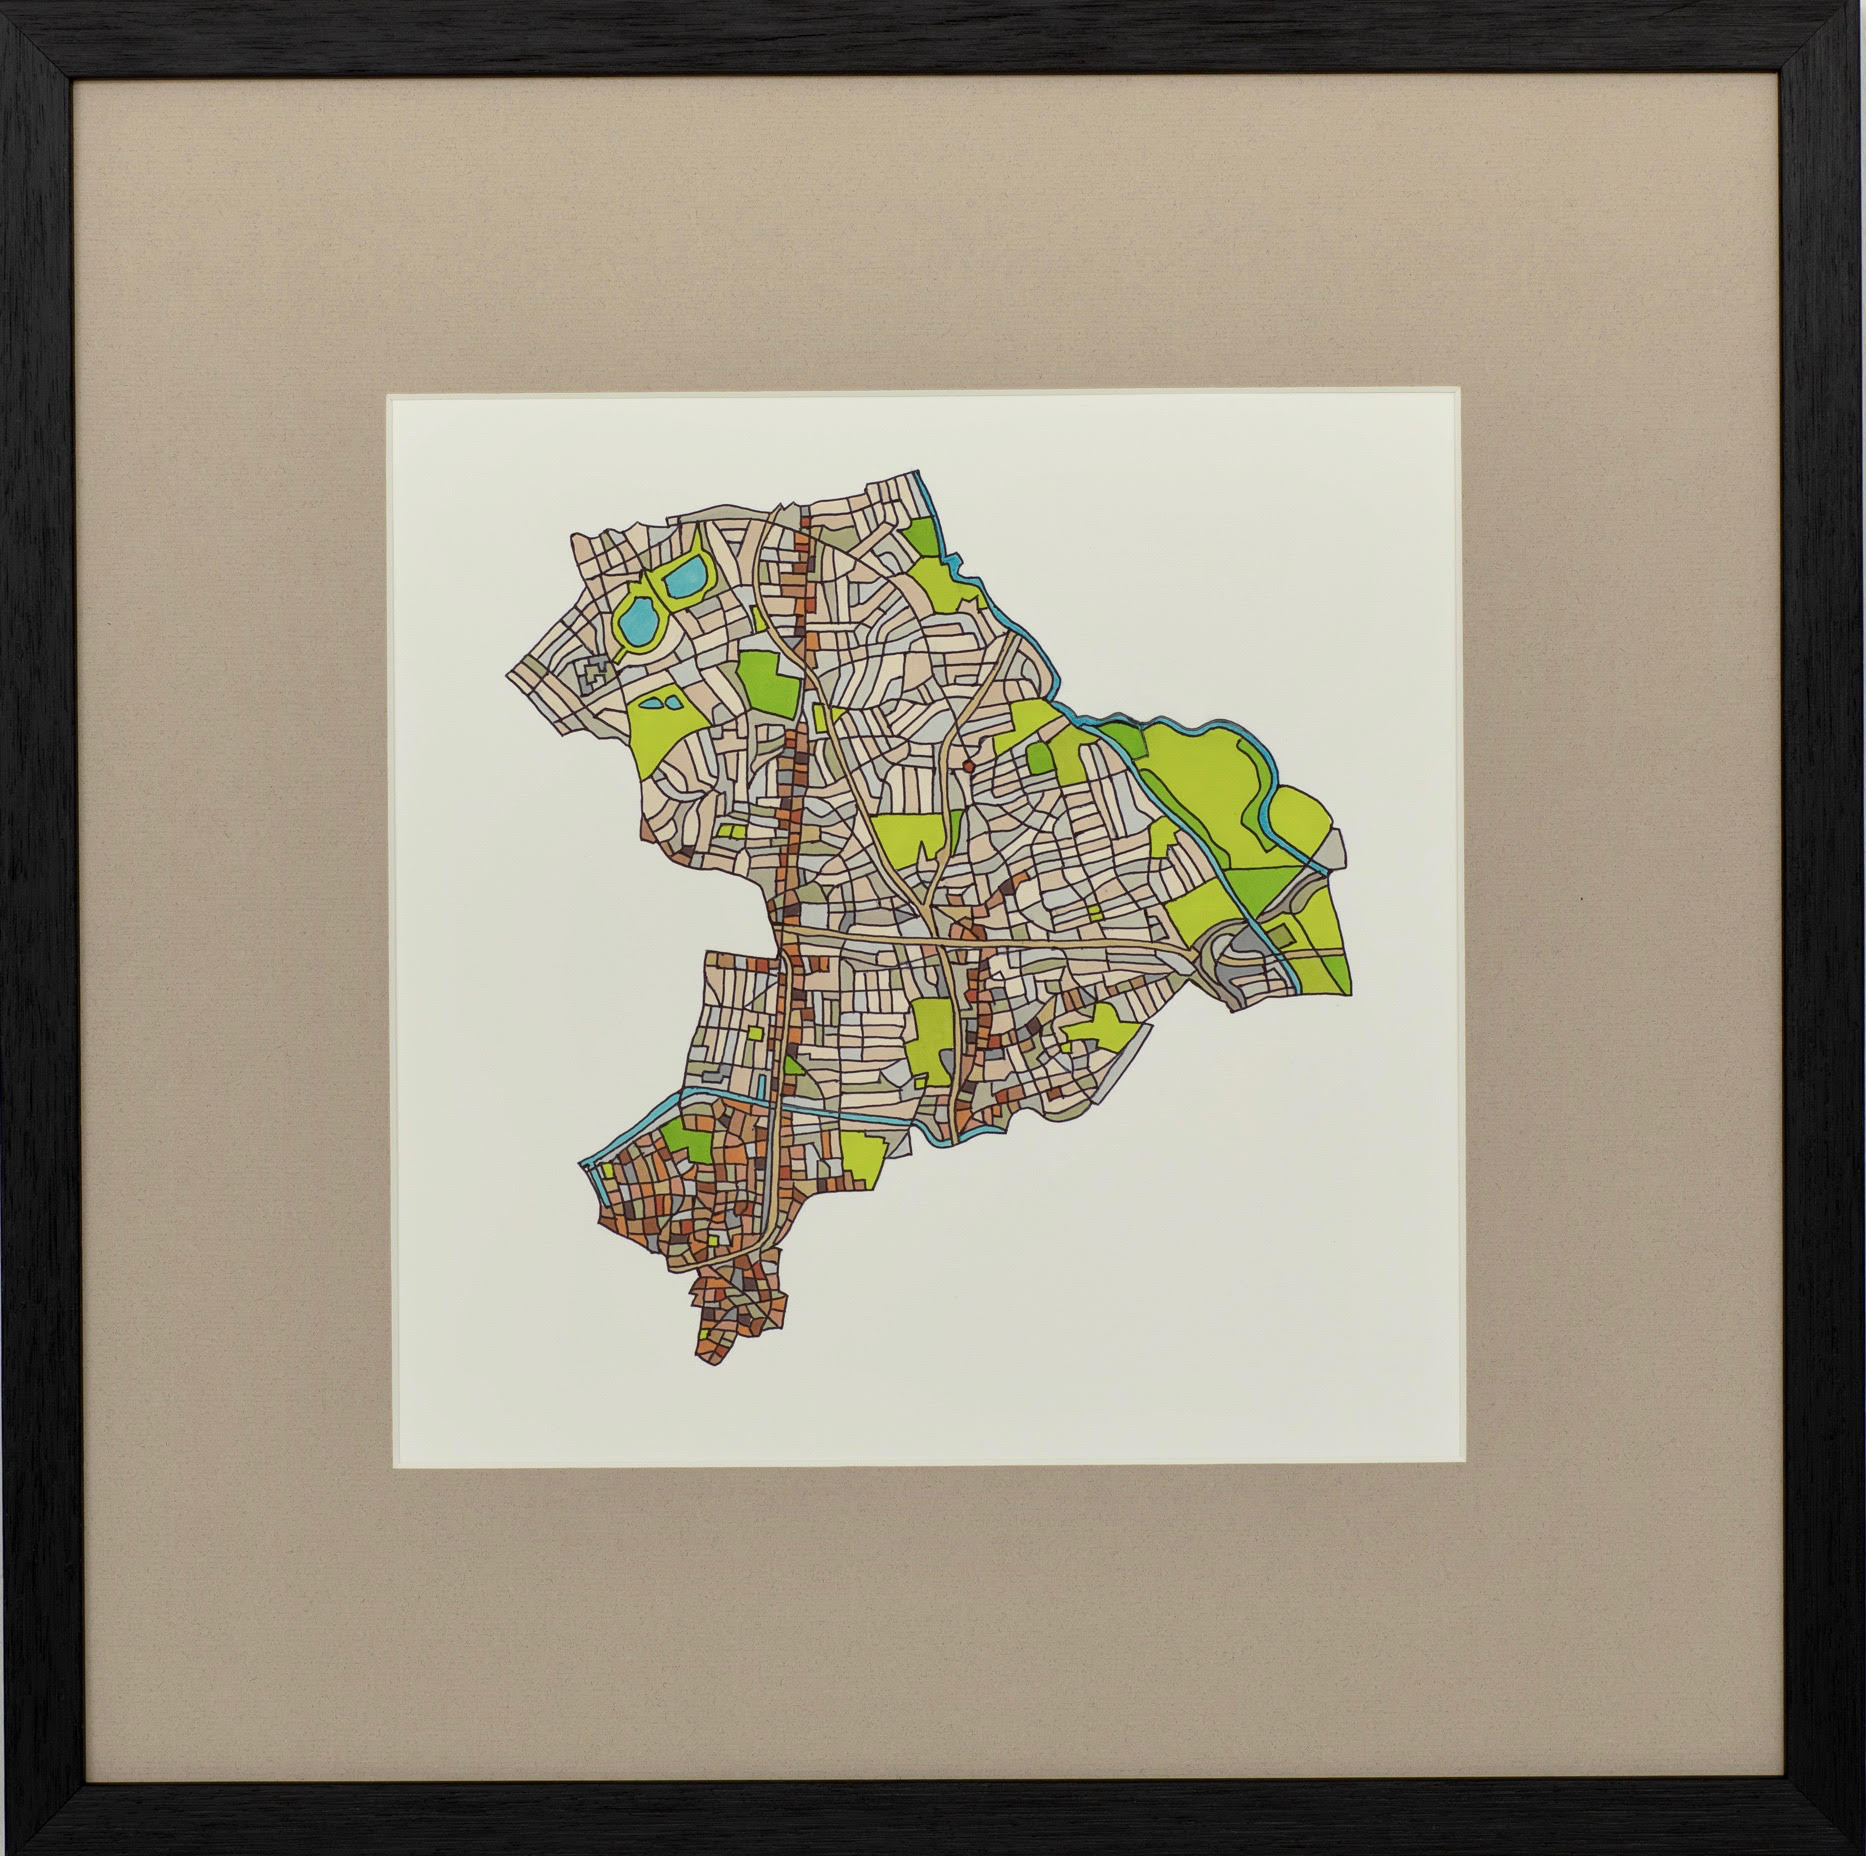 London Borough of Hackney, 2018 | Ink on Paper | 44 x 44 cm | £450 (framed)